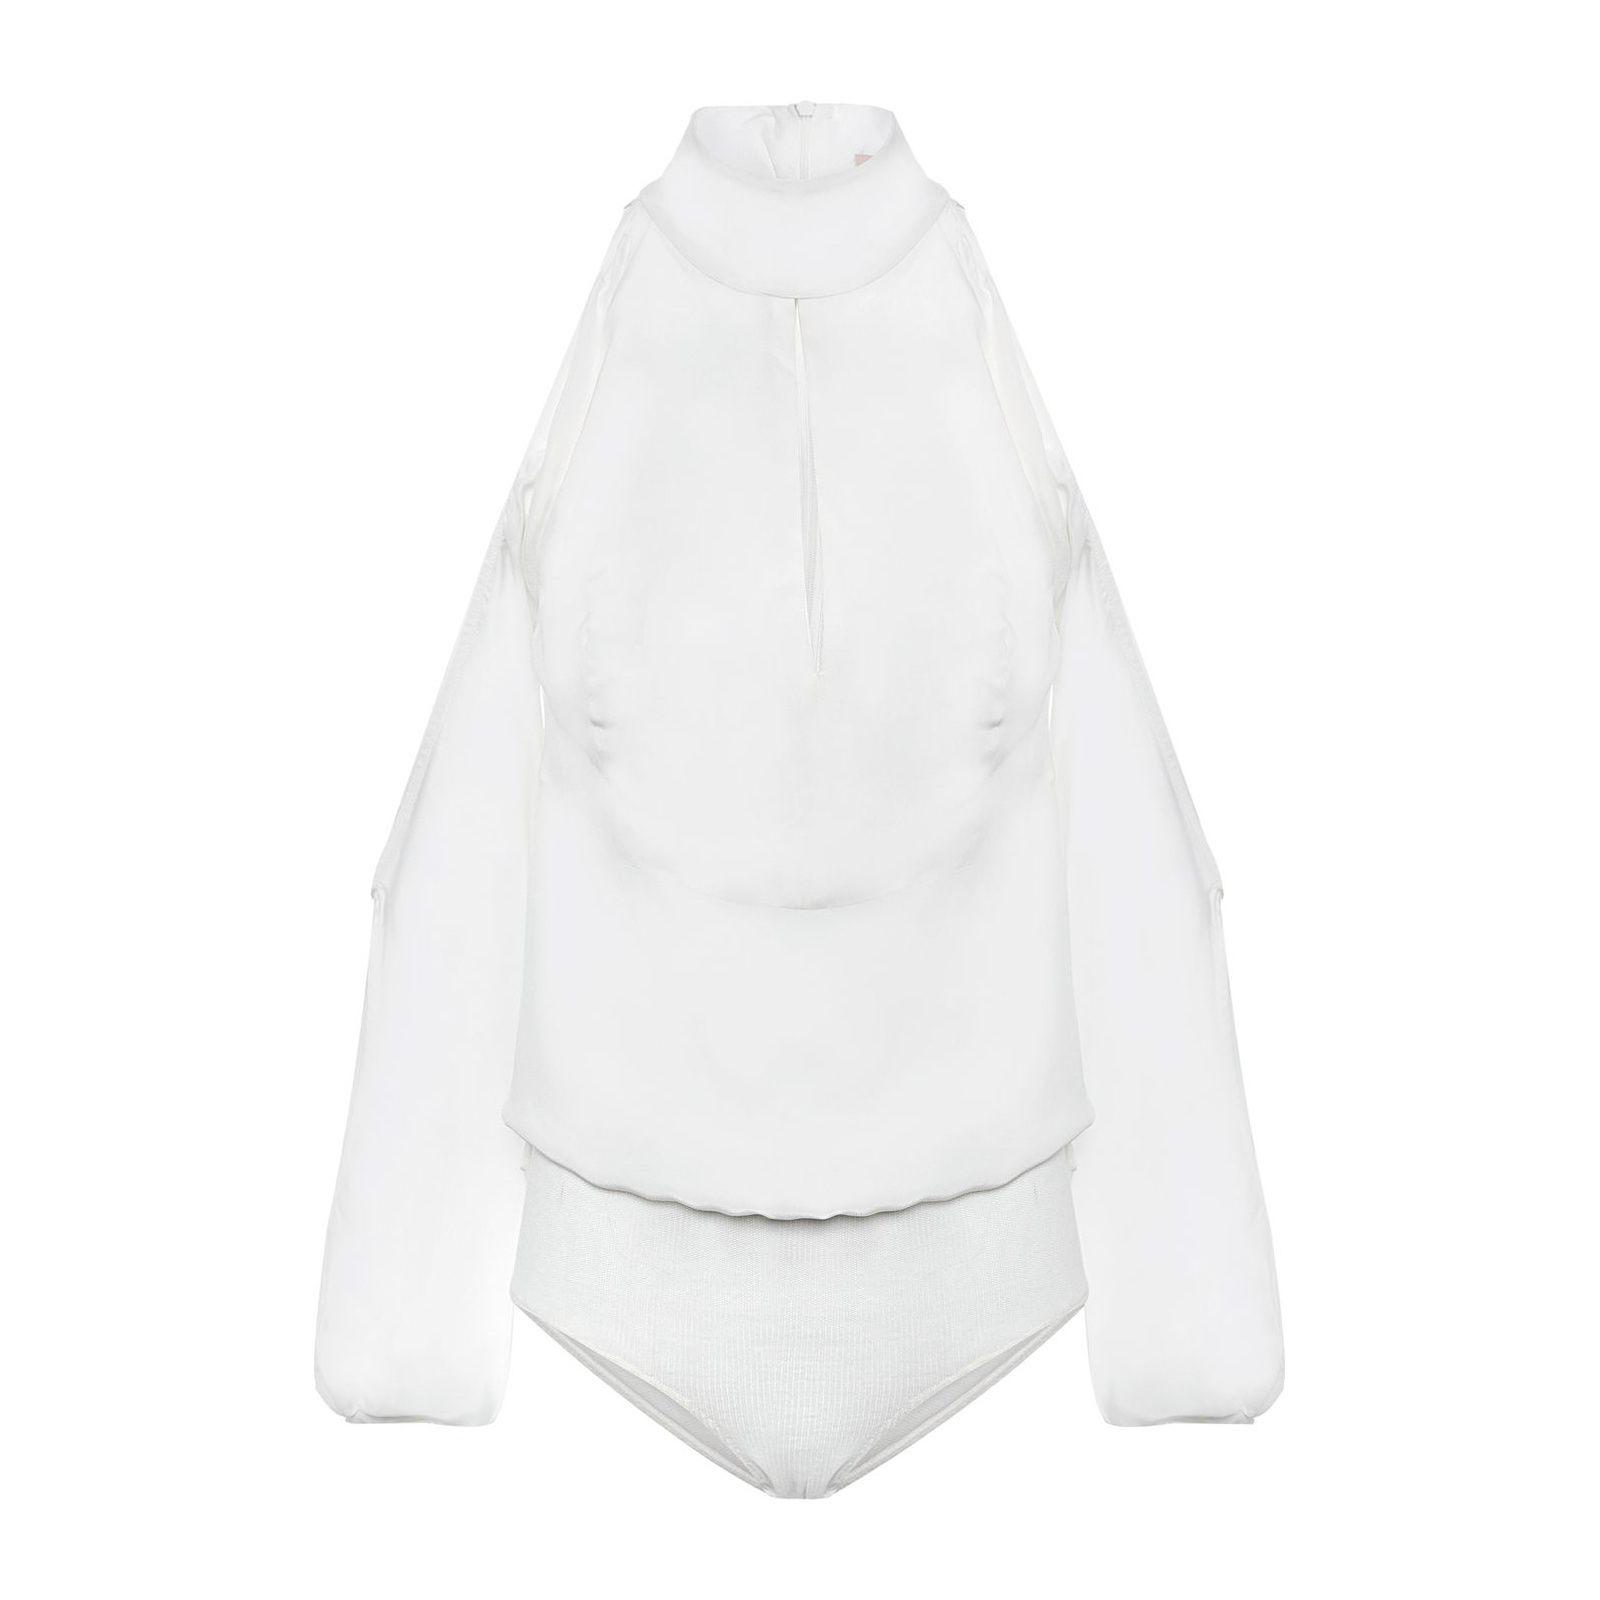 Body Manu - Off White